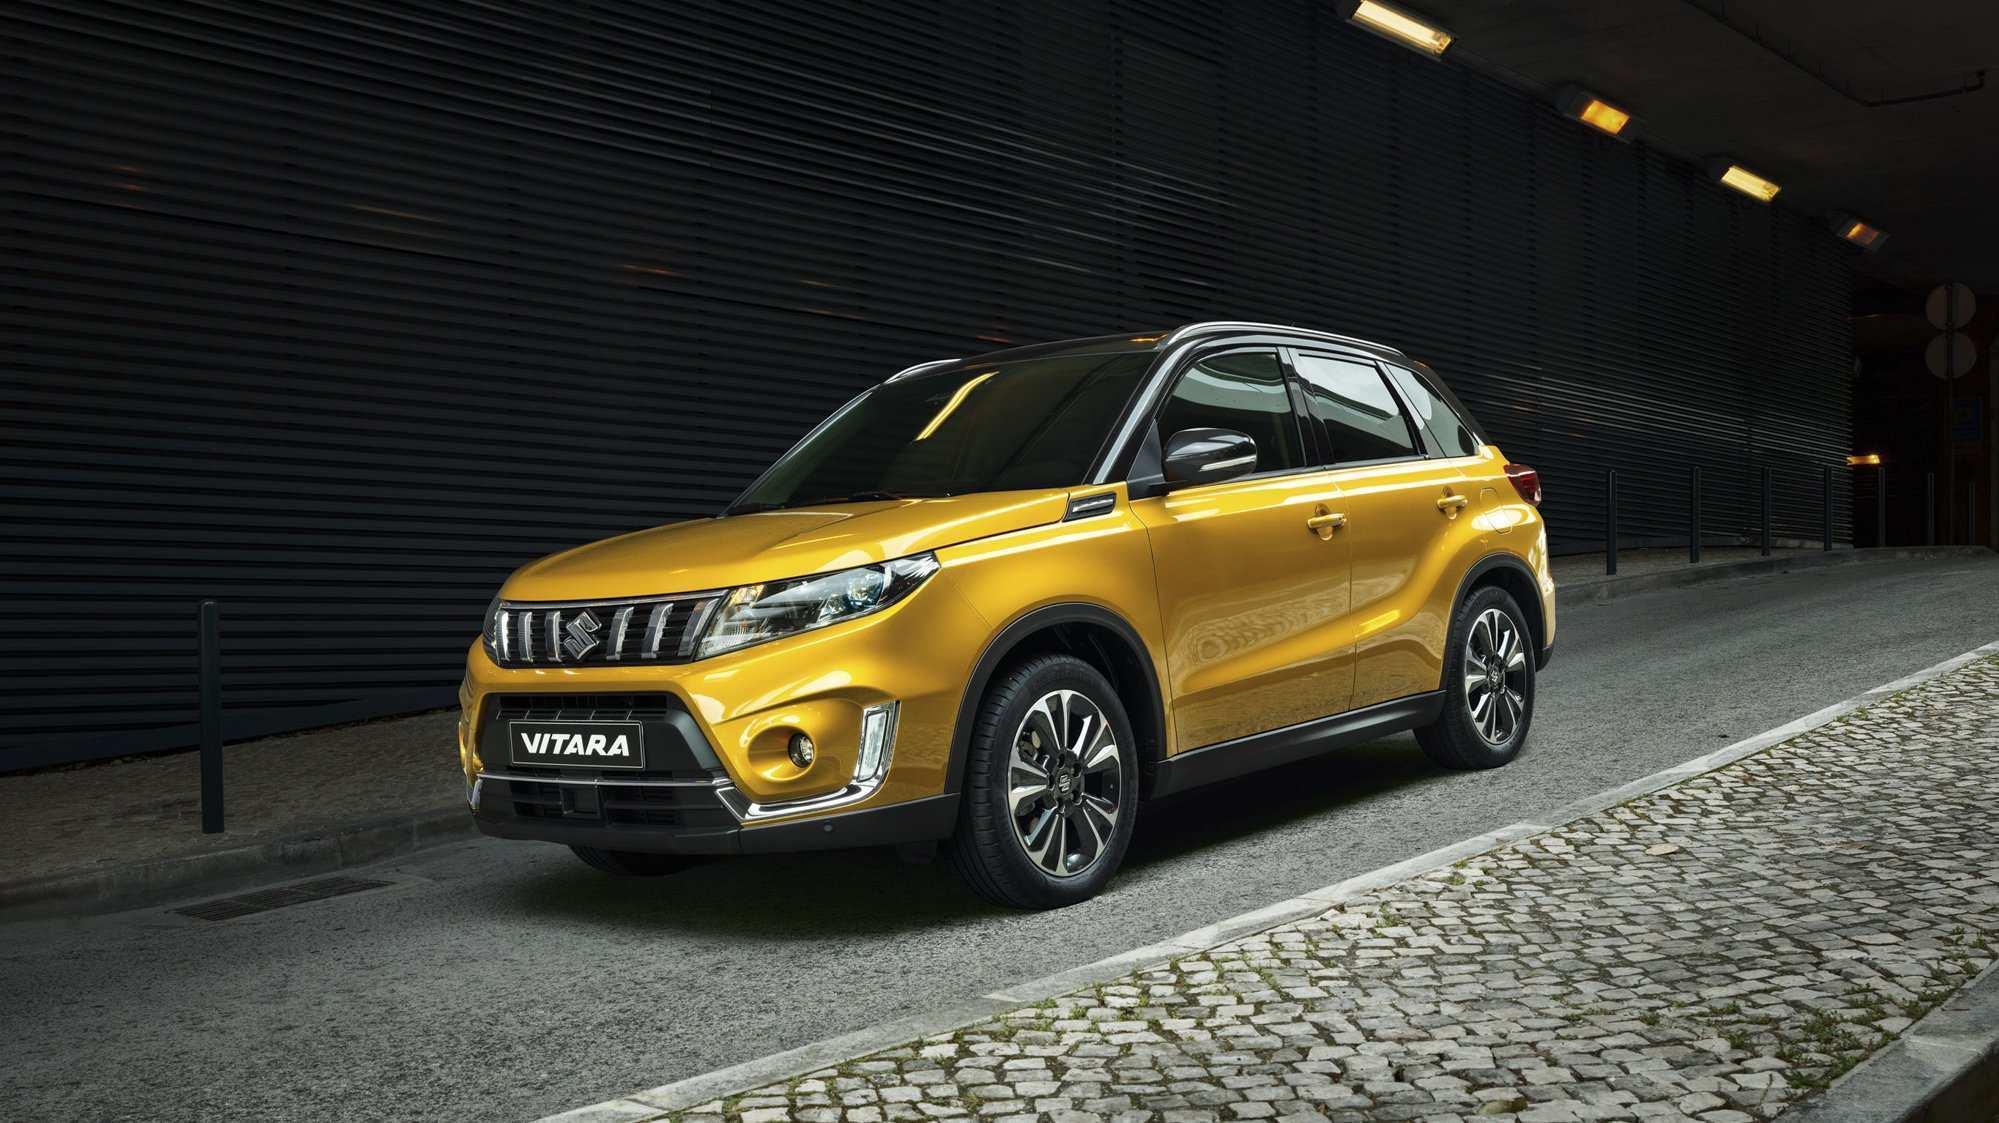 50 Concept of 2019 Suzuki Vitara New Concept by 2019 Suzuki Vitara